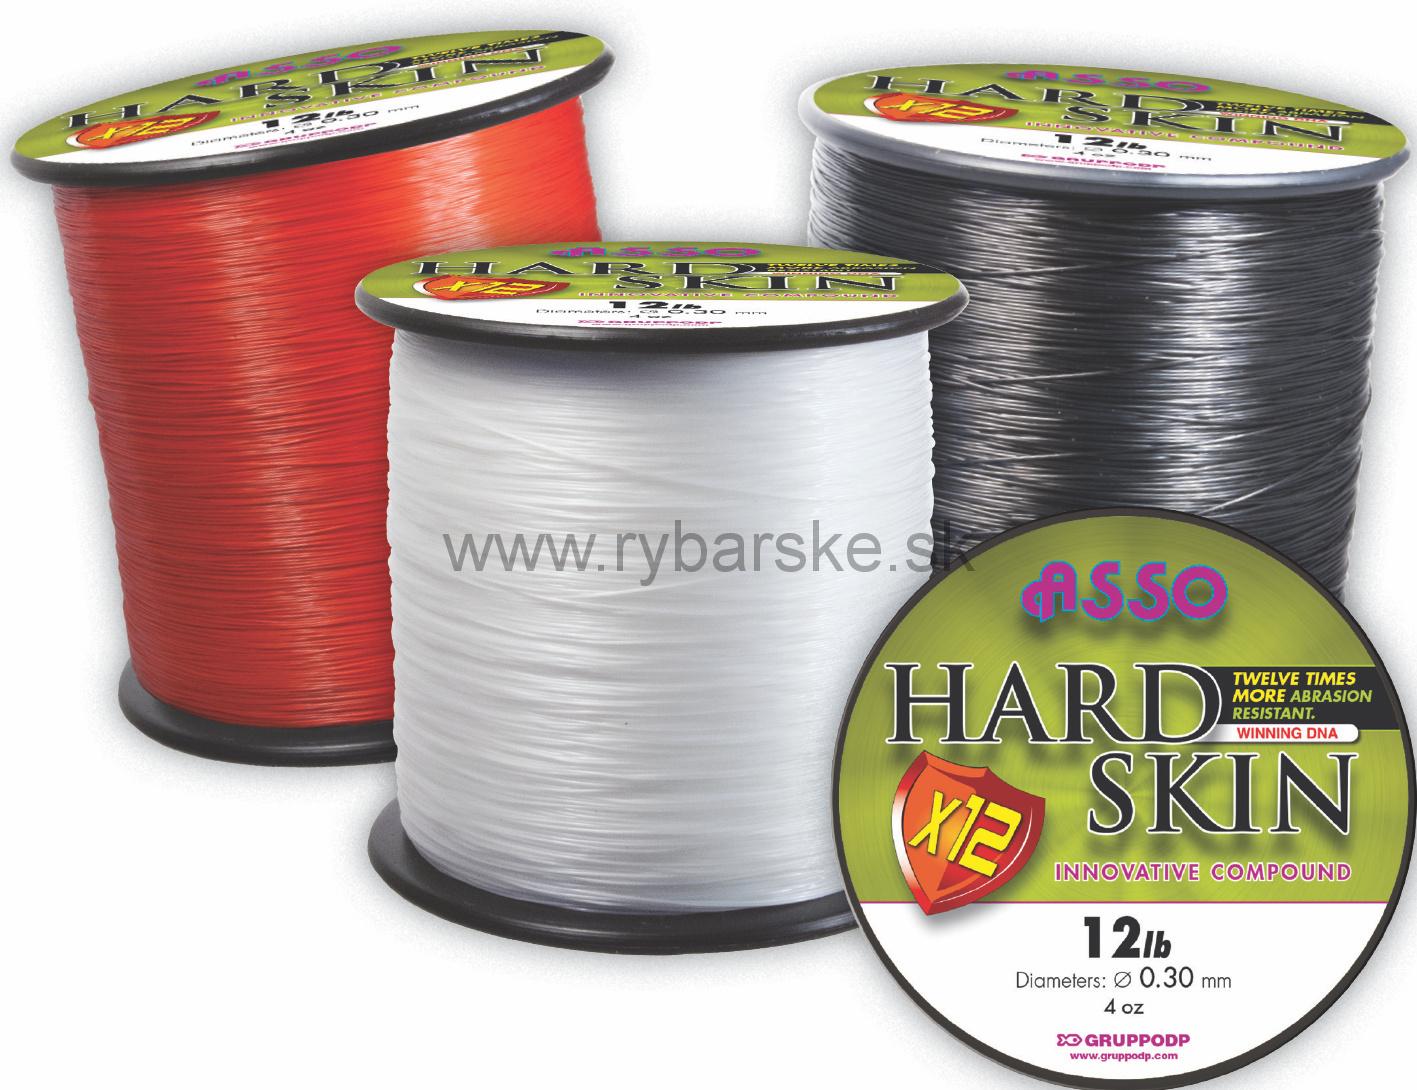 /produkty/28/kaprove-silony/Asso/Asso-Hard-Skin